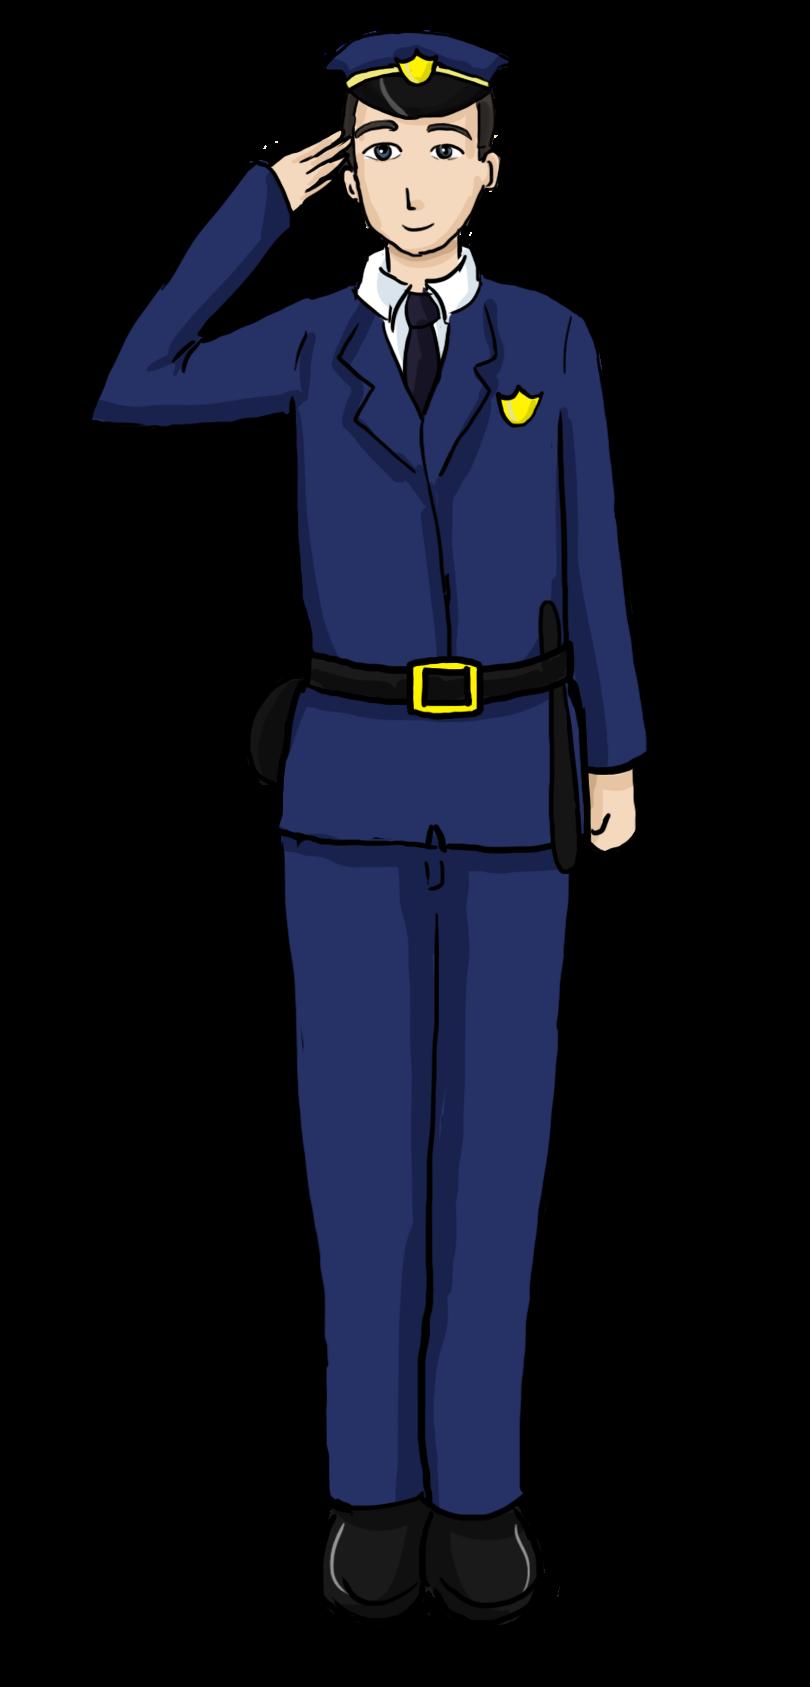 Policeman PNG HD Free - 120565